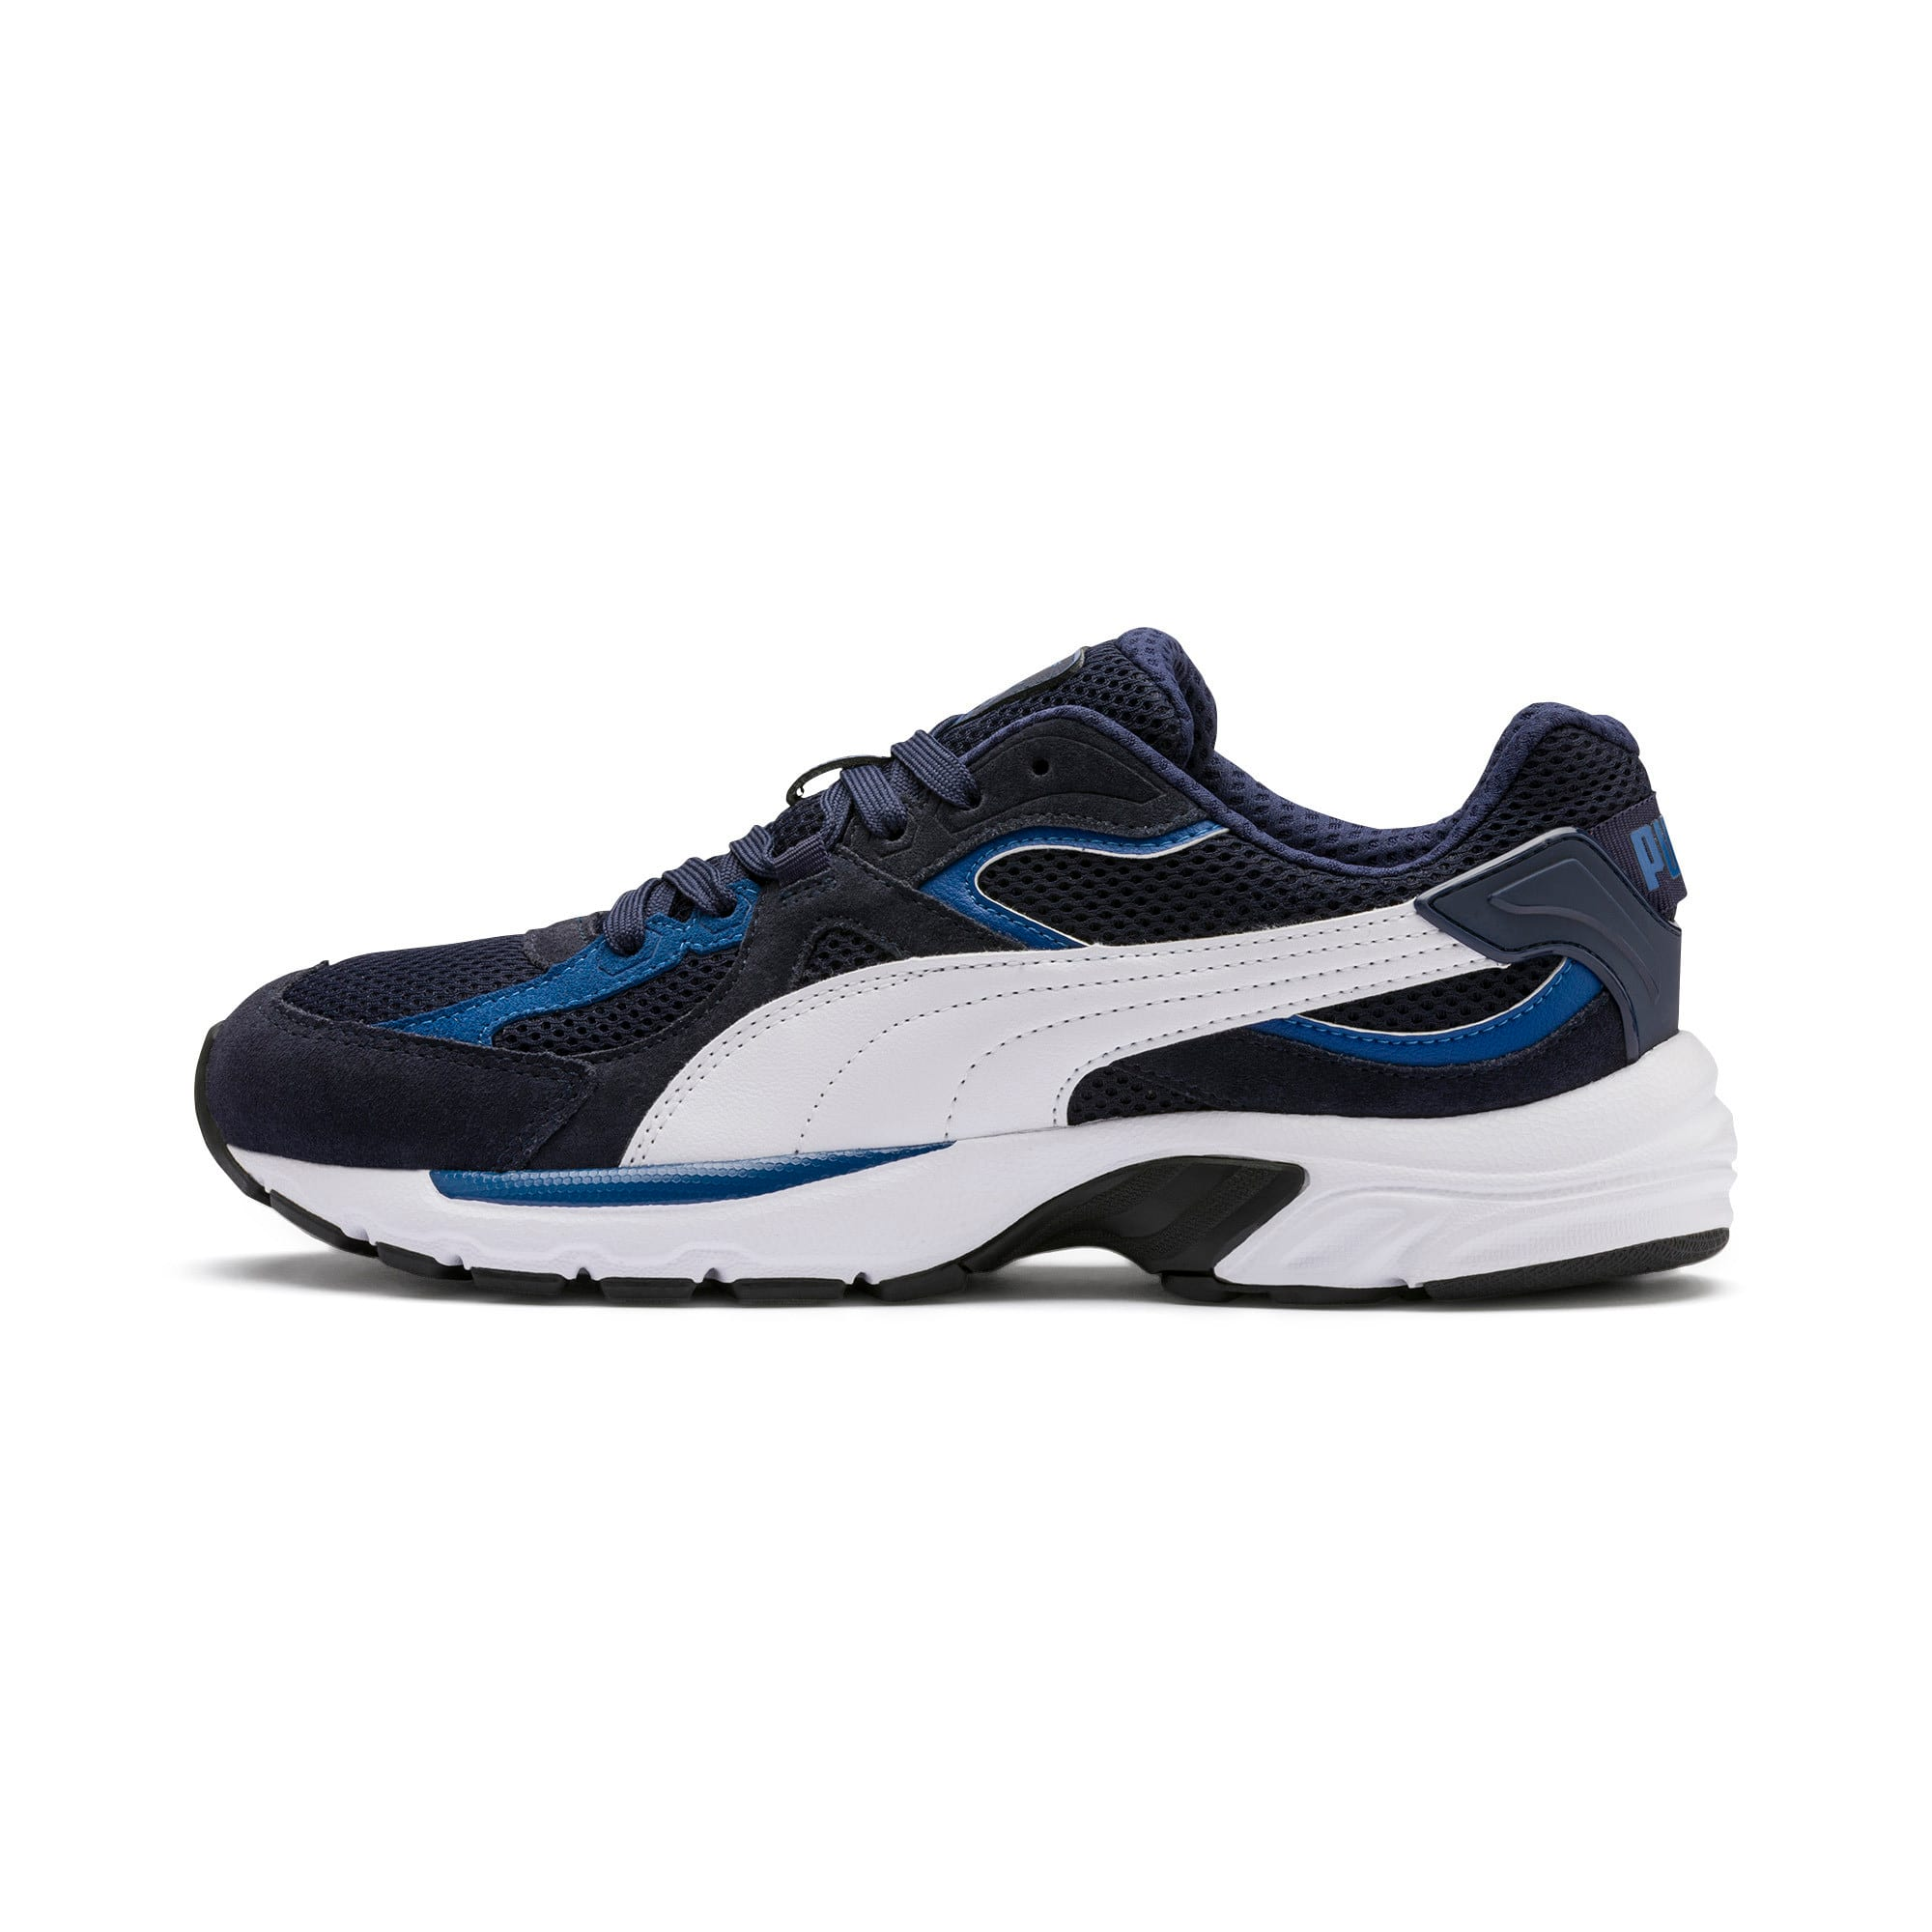 Miniatura 1 de Zapatos deportivos Axis Plus Suede, Peacoat-G Blue-White-Black, mediano